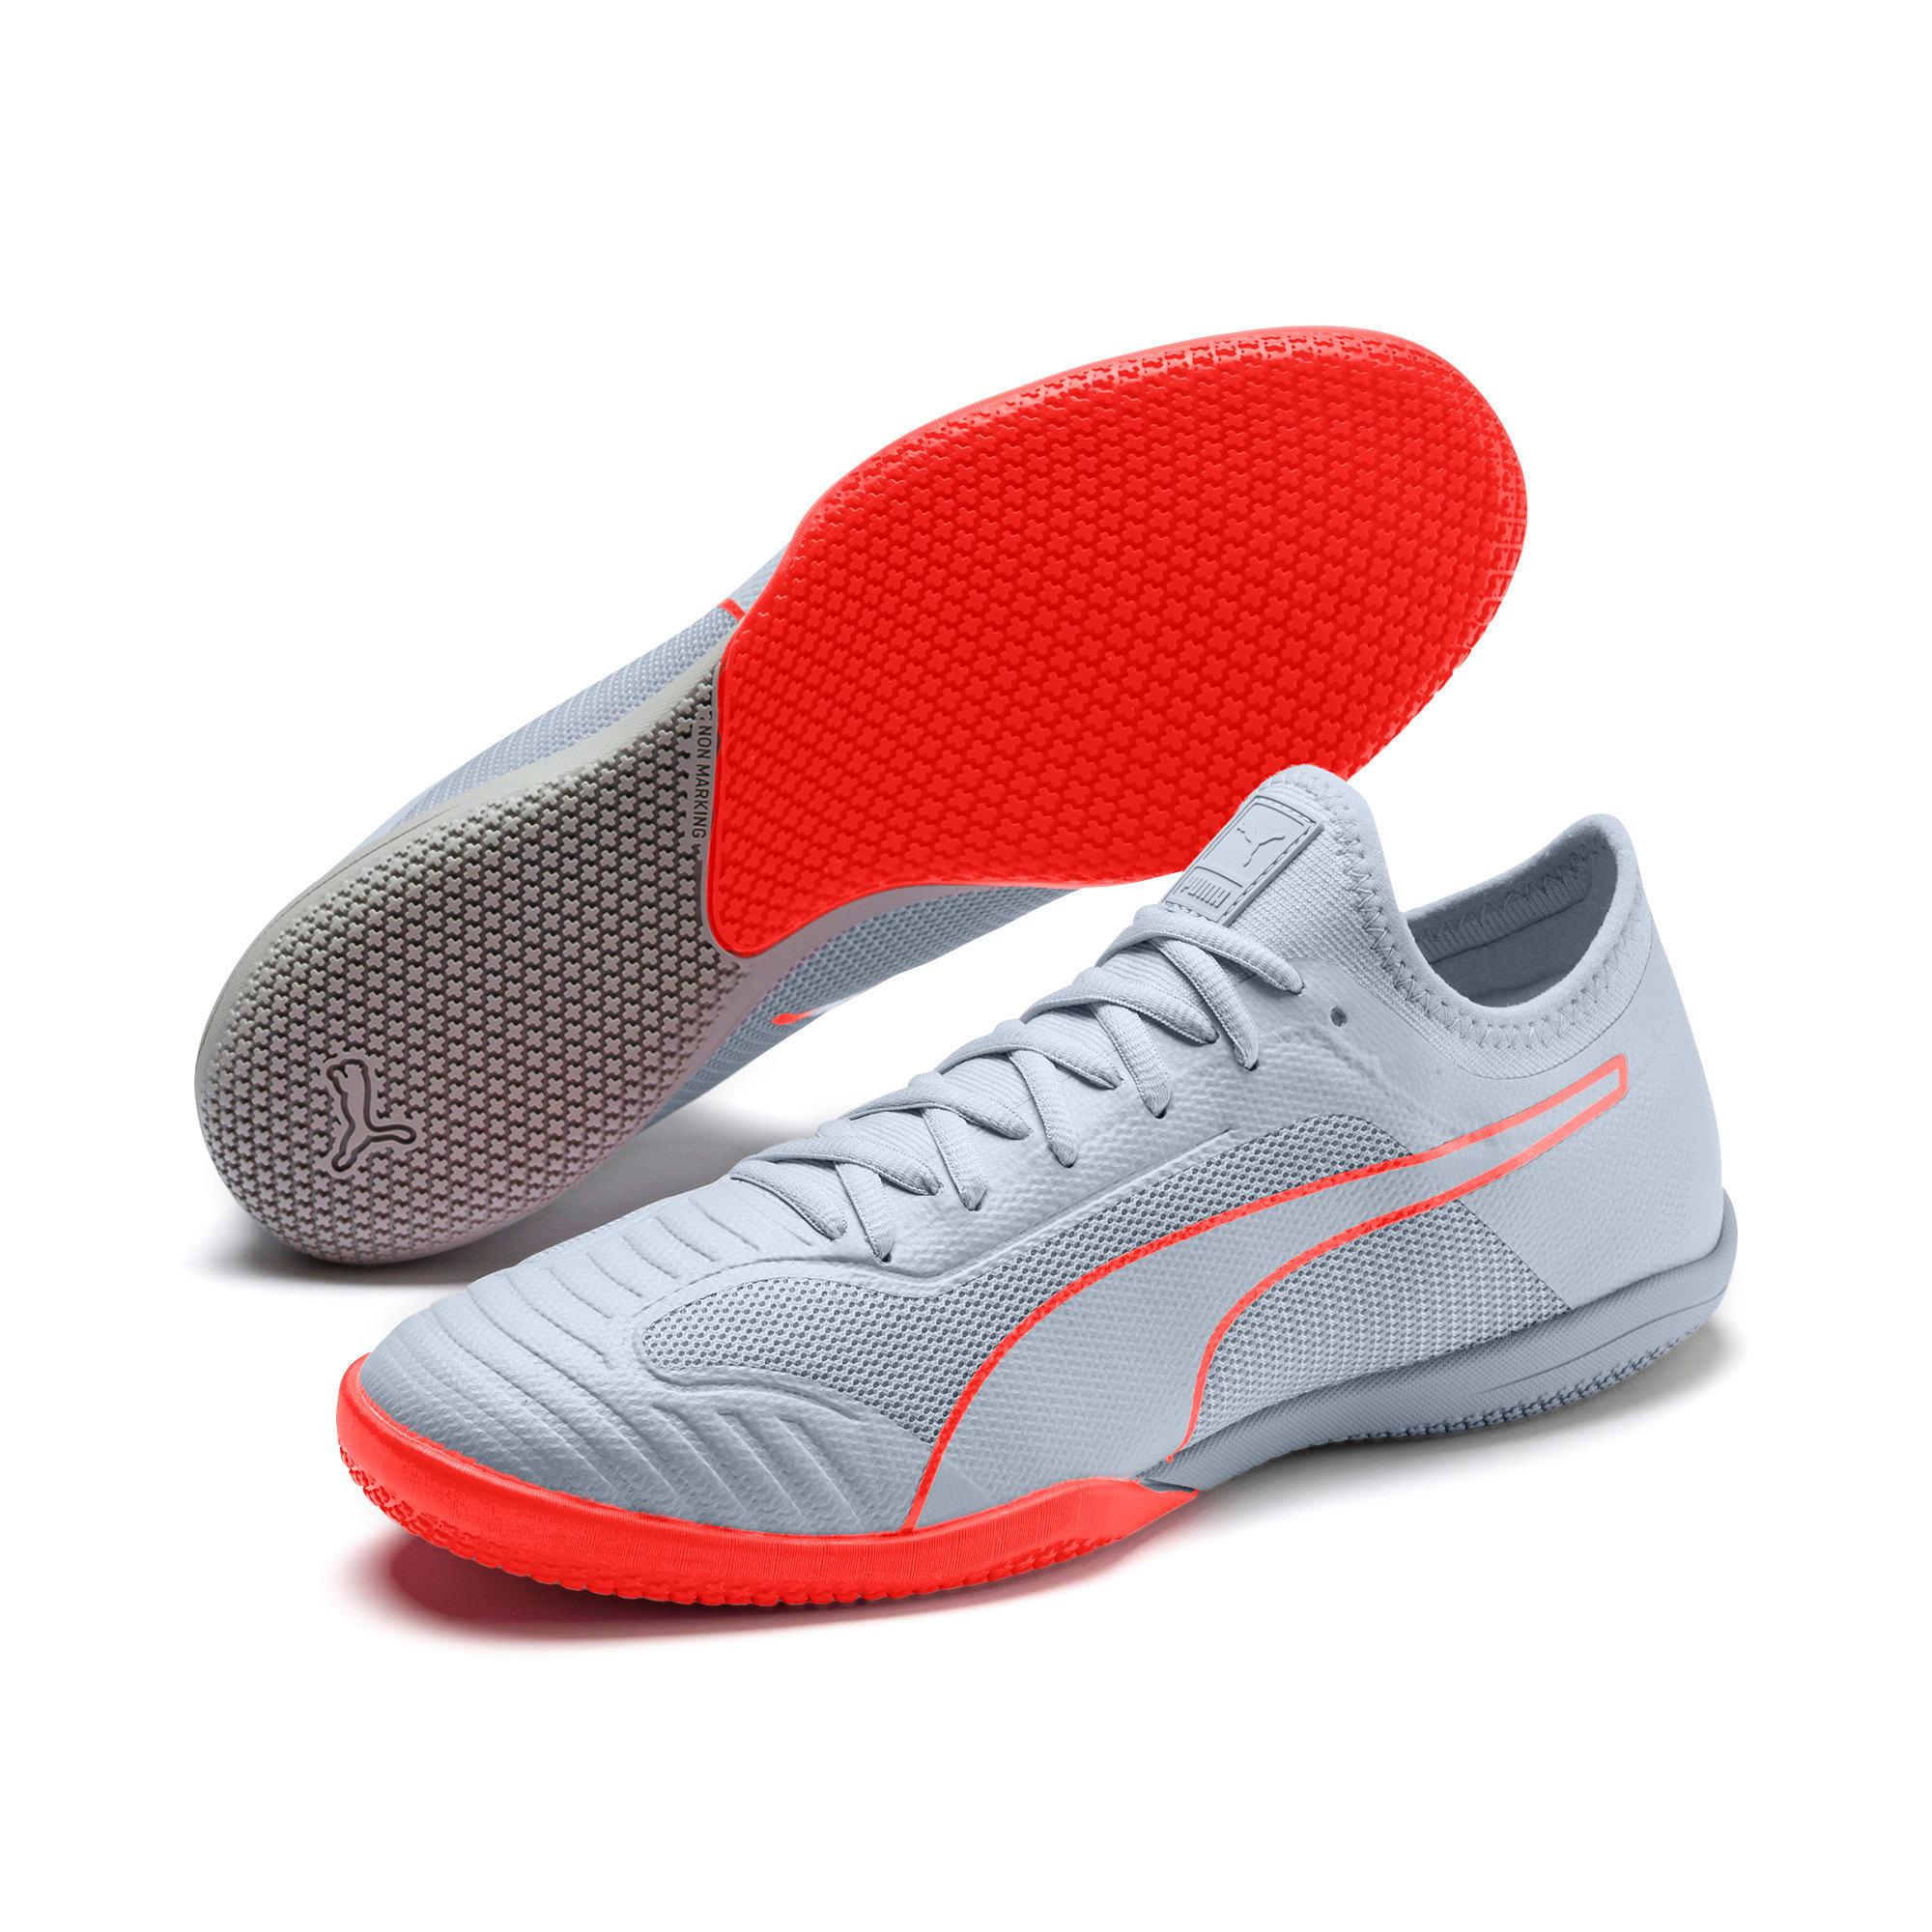 Thumbnail 2 of 365 Sala 1 Men's Soccer Shoes, Grey Dawn-Nrgy Red, medium